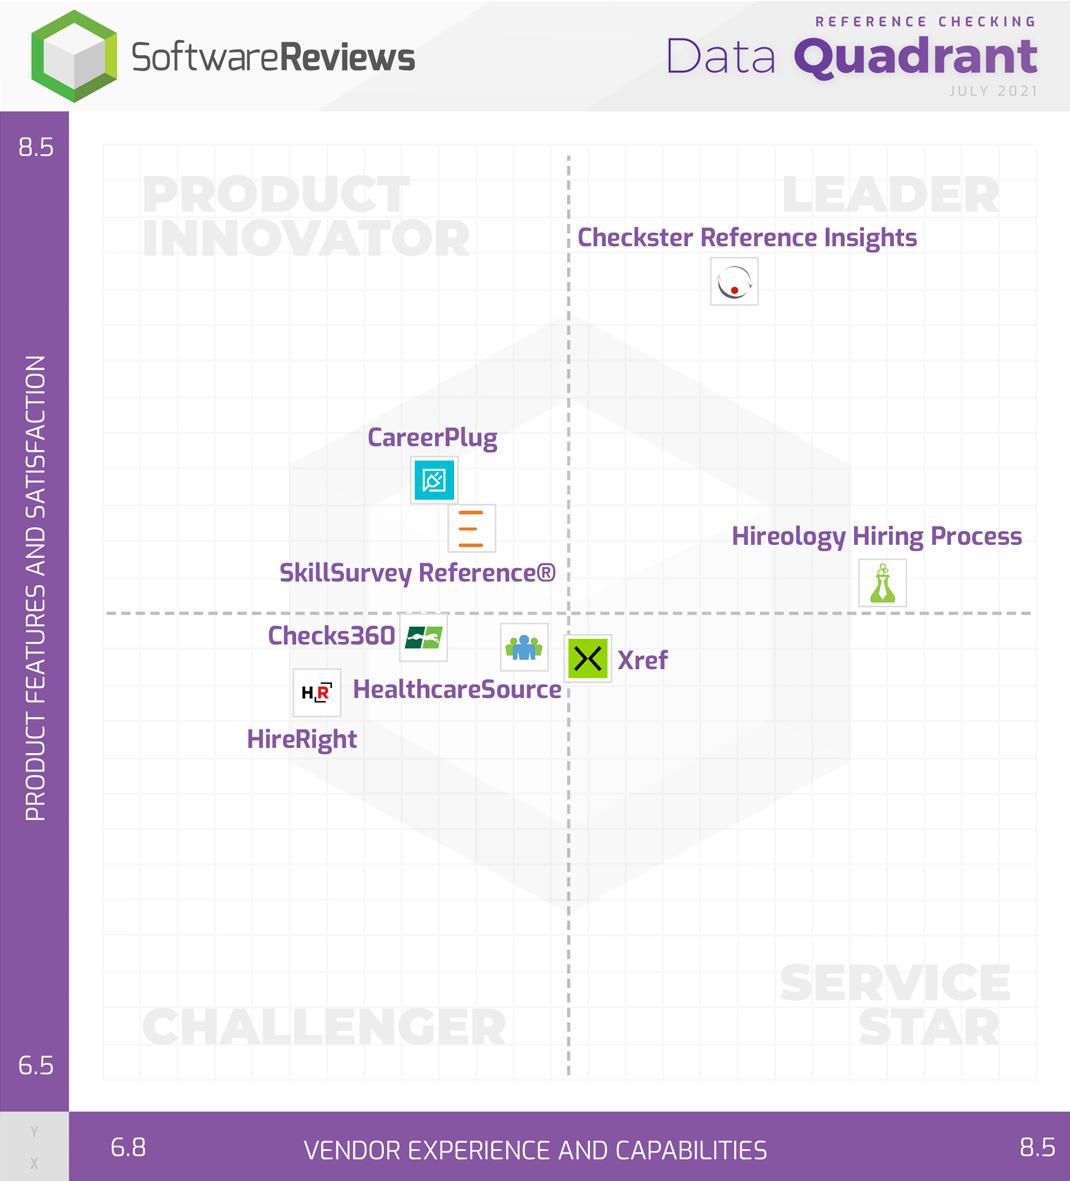 Reference Checking Data Quadrant